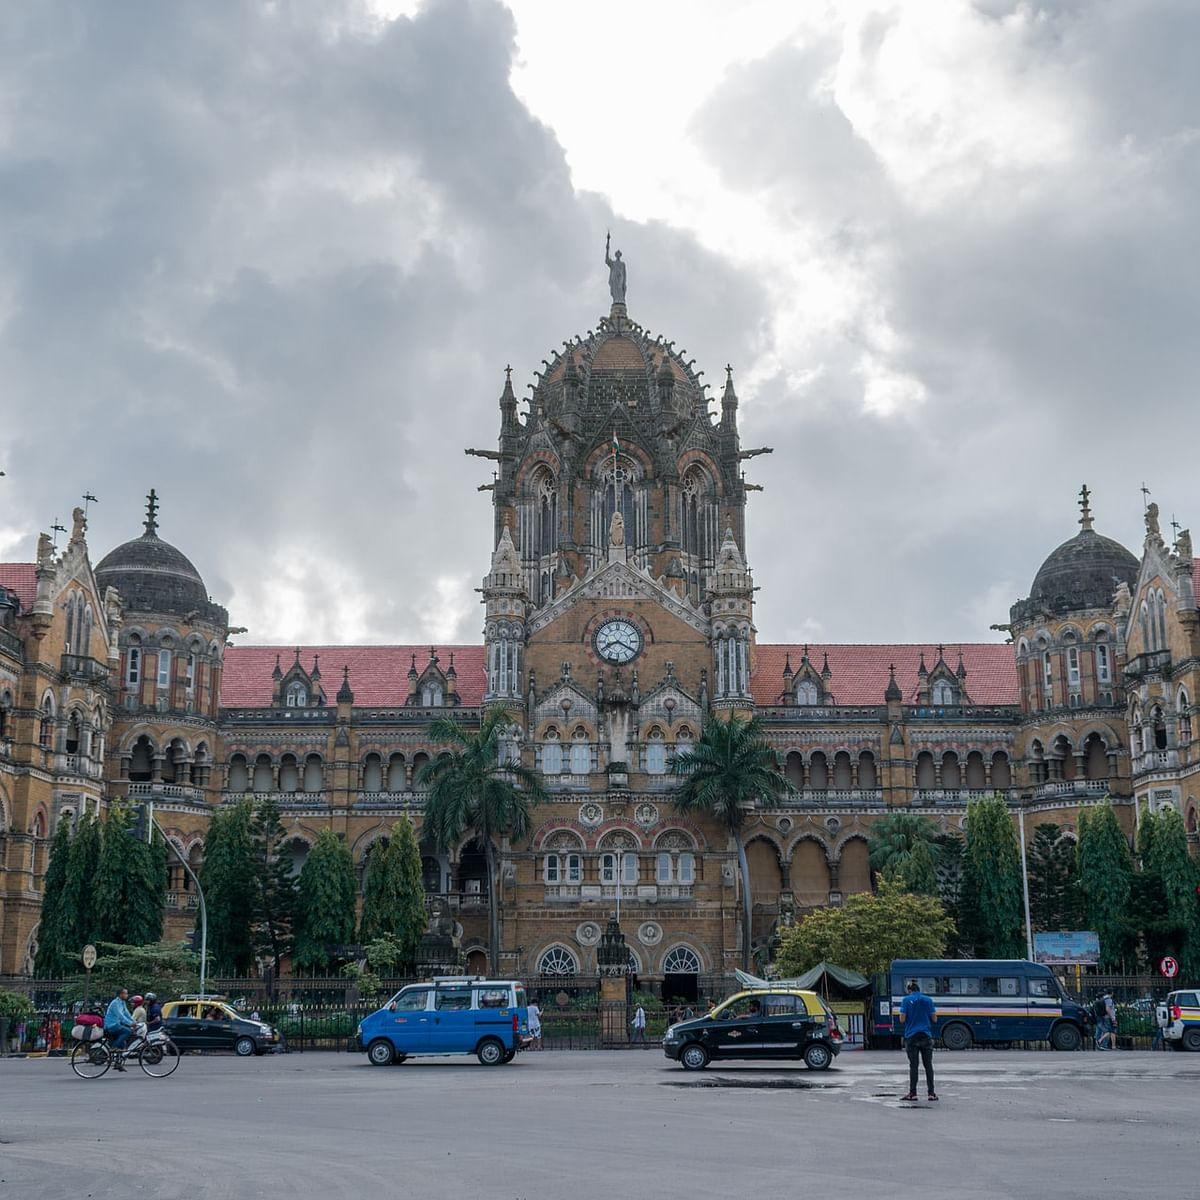 Mumbai: Latest updates - Charas found hidden in petrol tanks of motorbikes